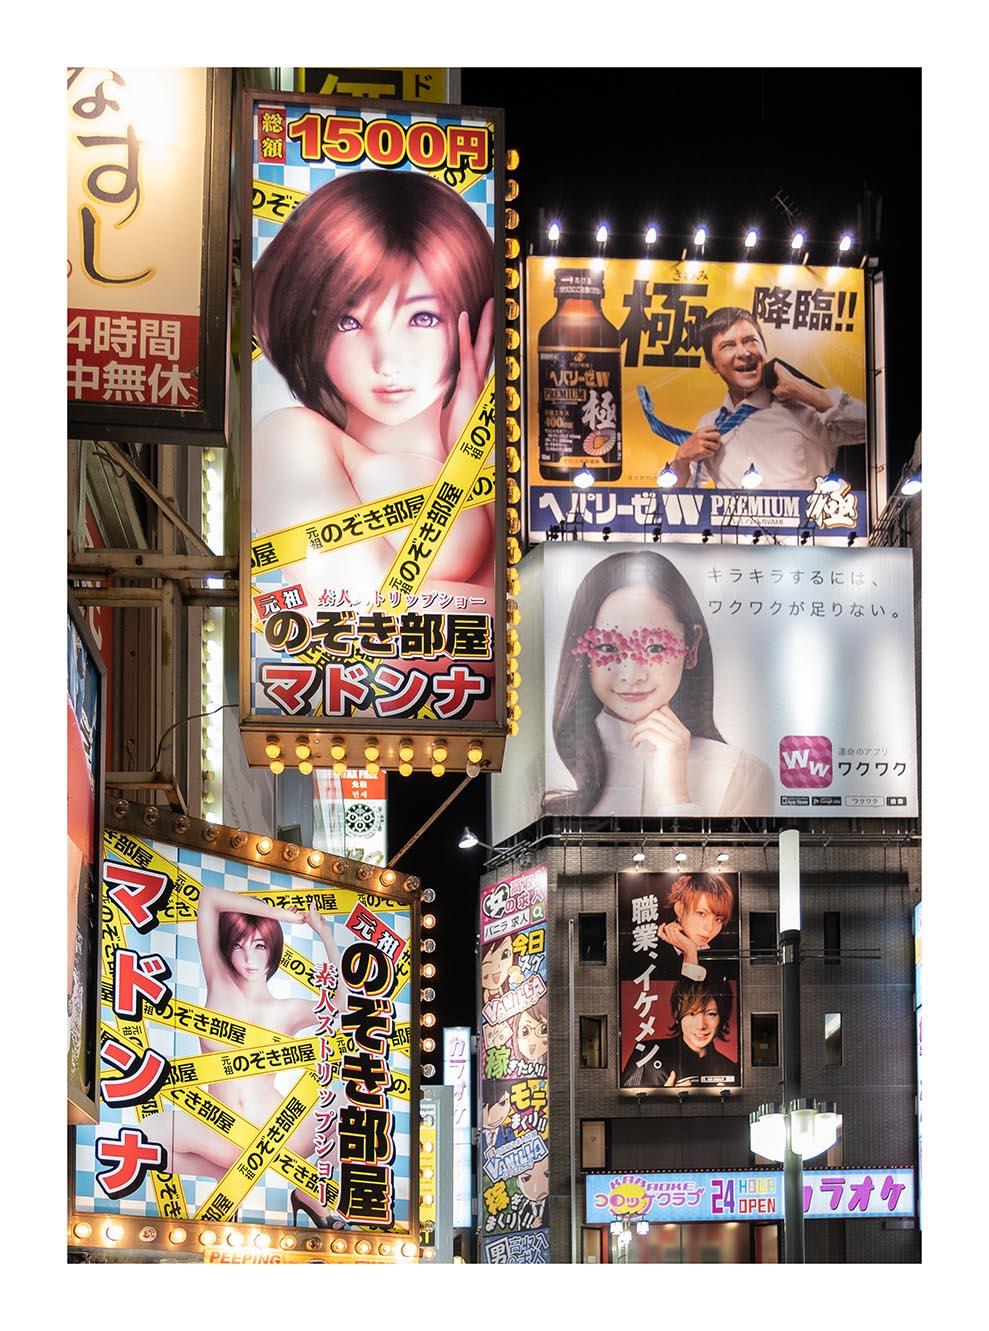 Tokyo_Neon_050_Juxta.jpg